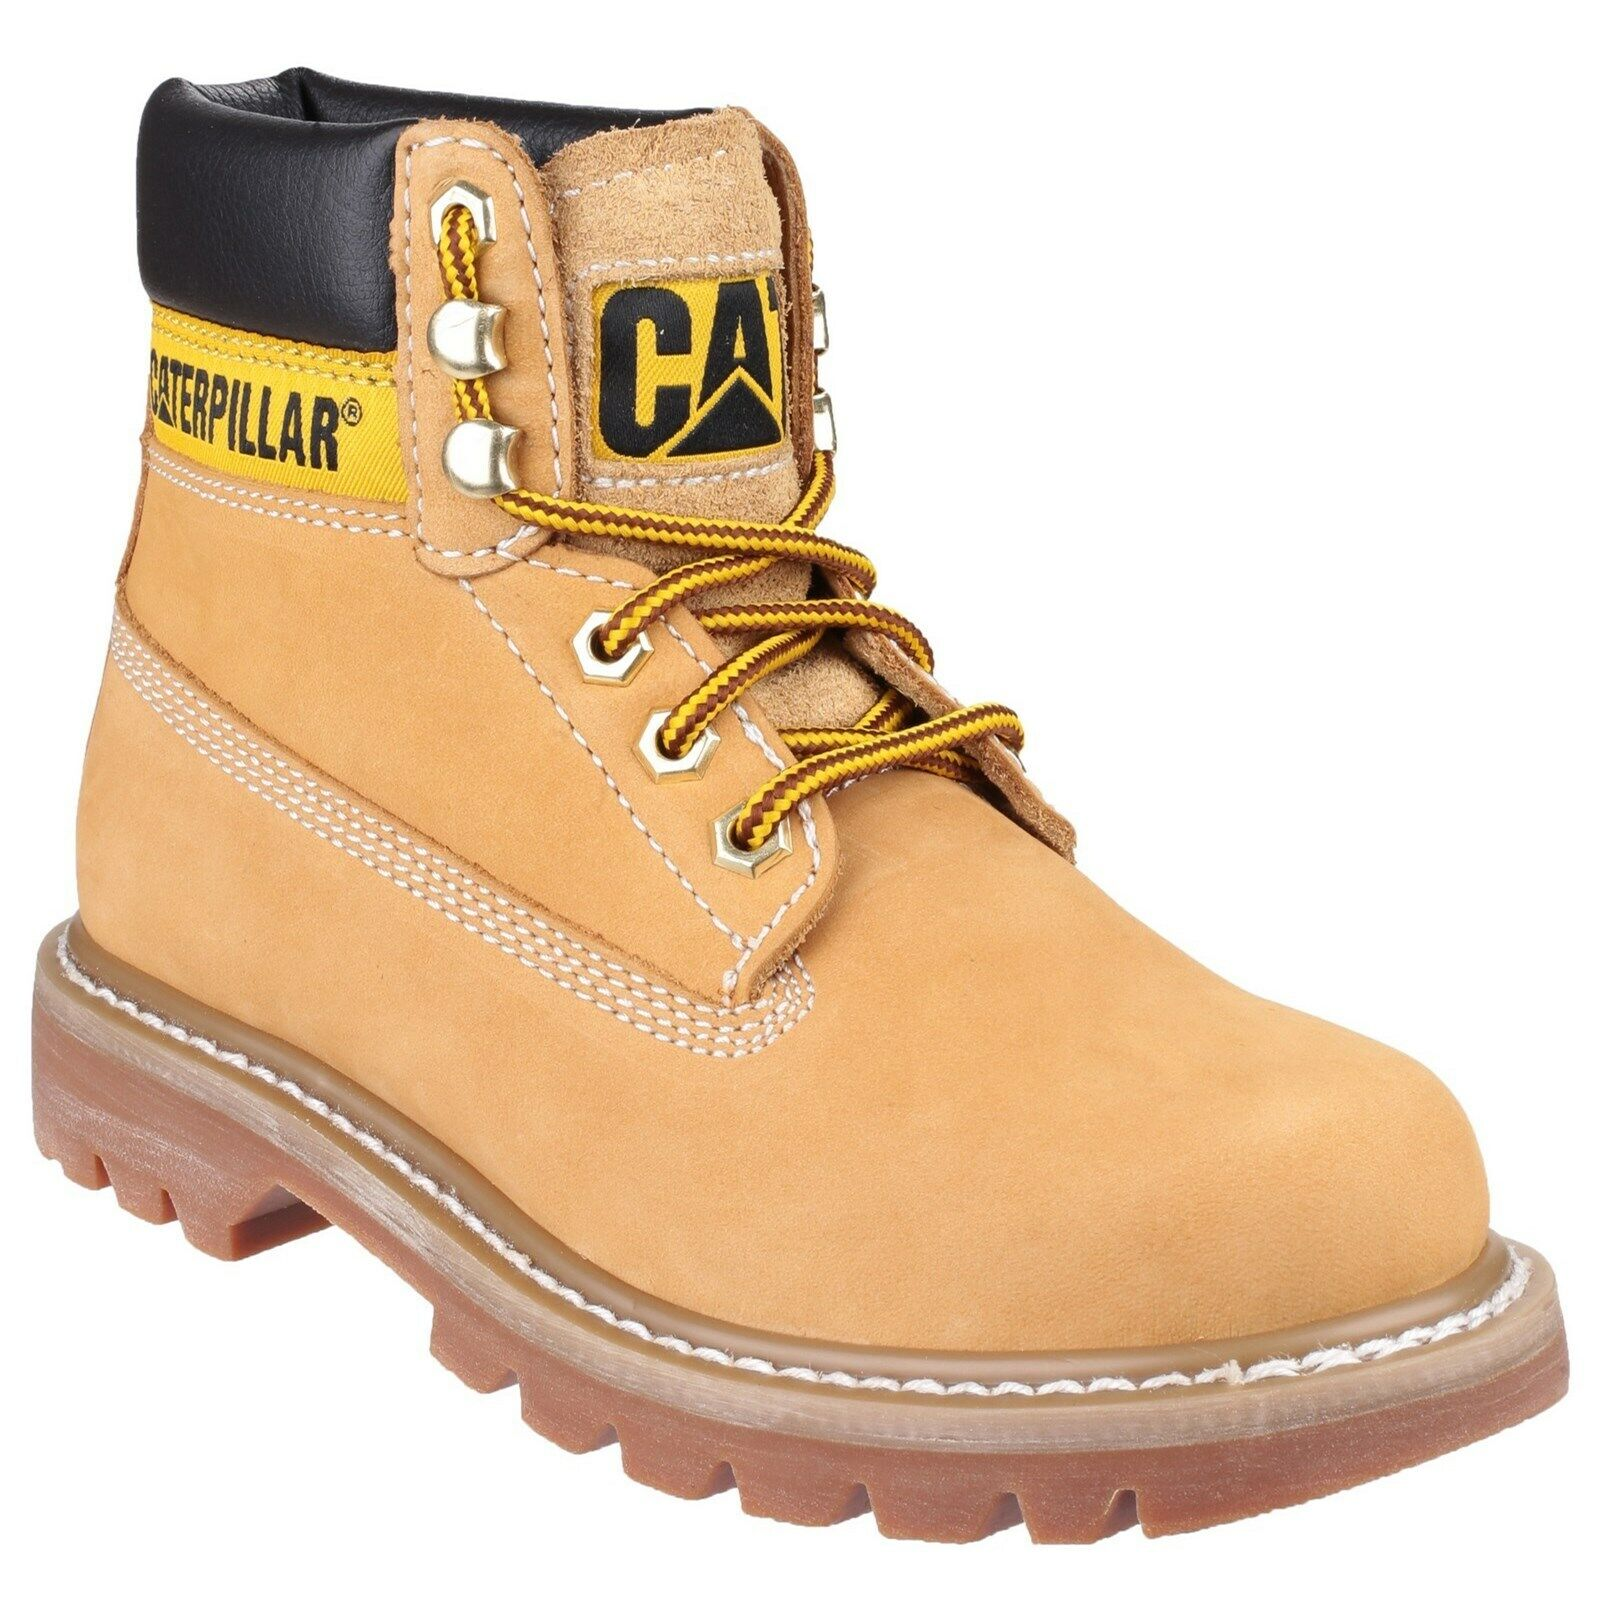 Caterpillar Colorado Ladies Boots Honey Reset UK Size